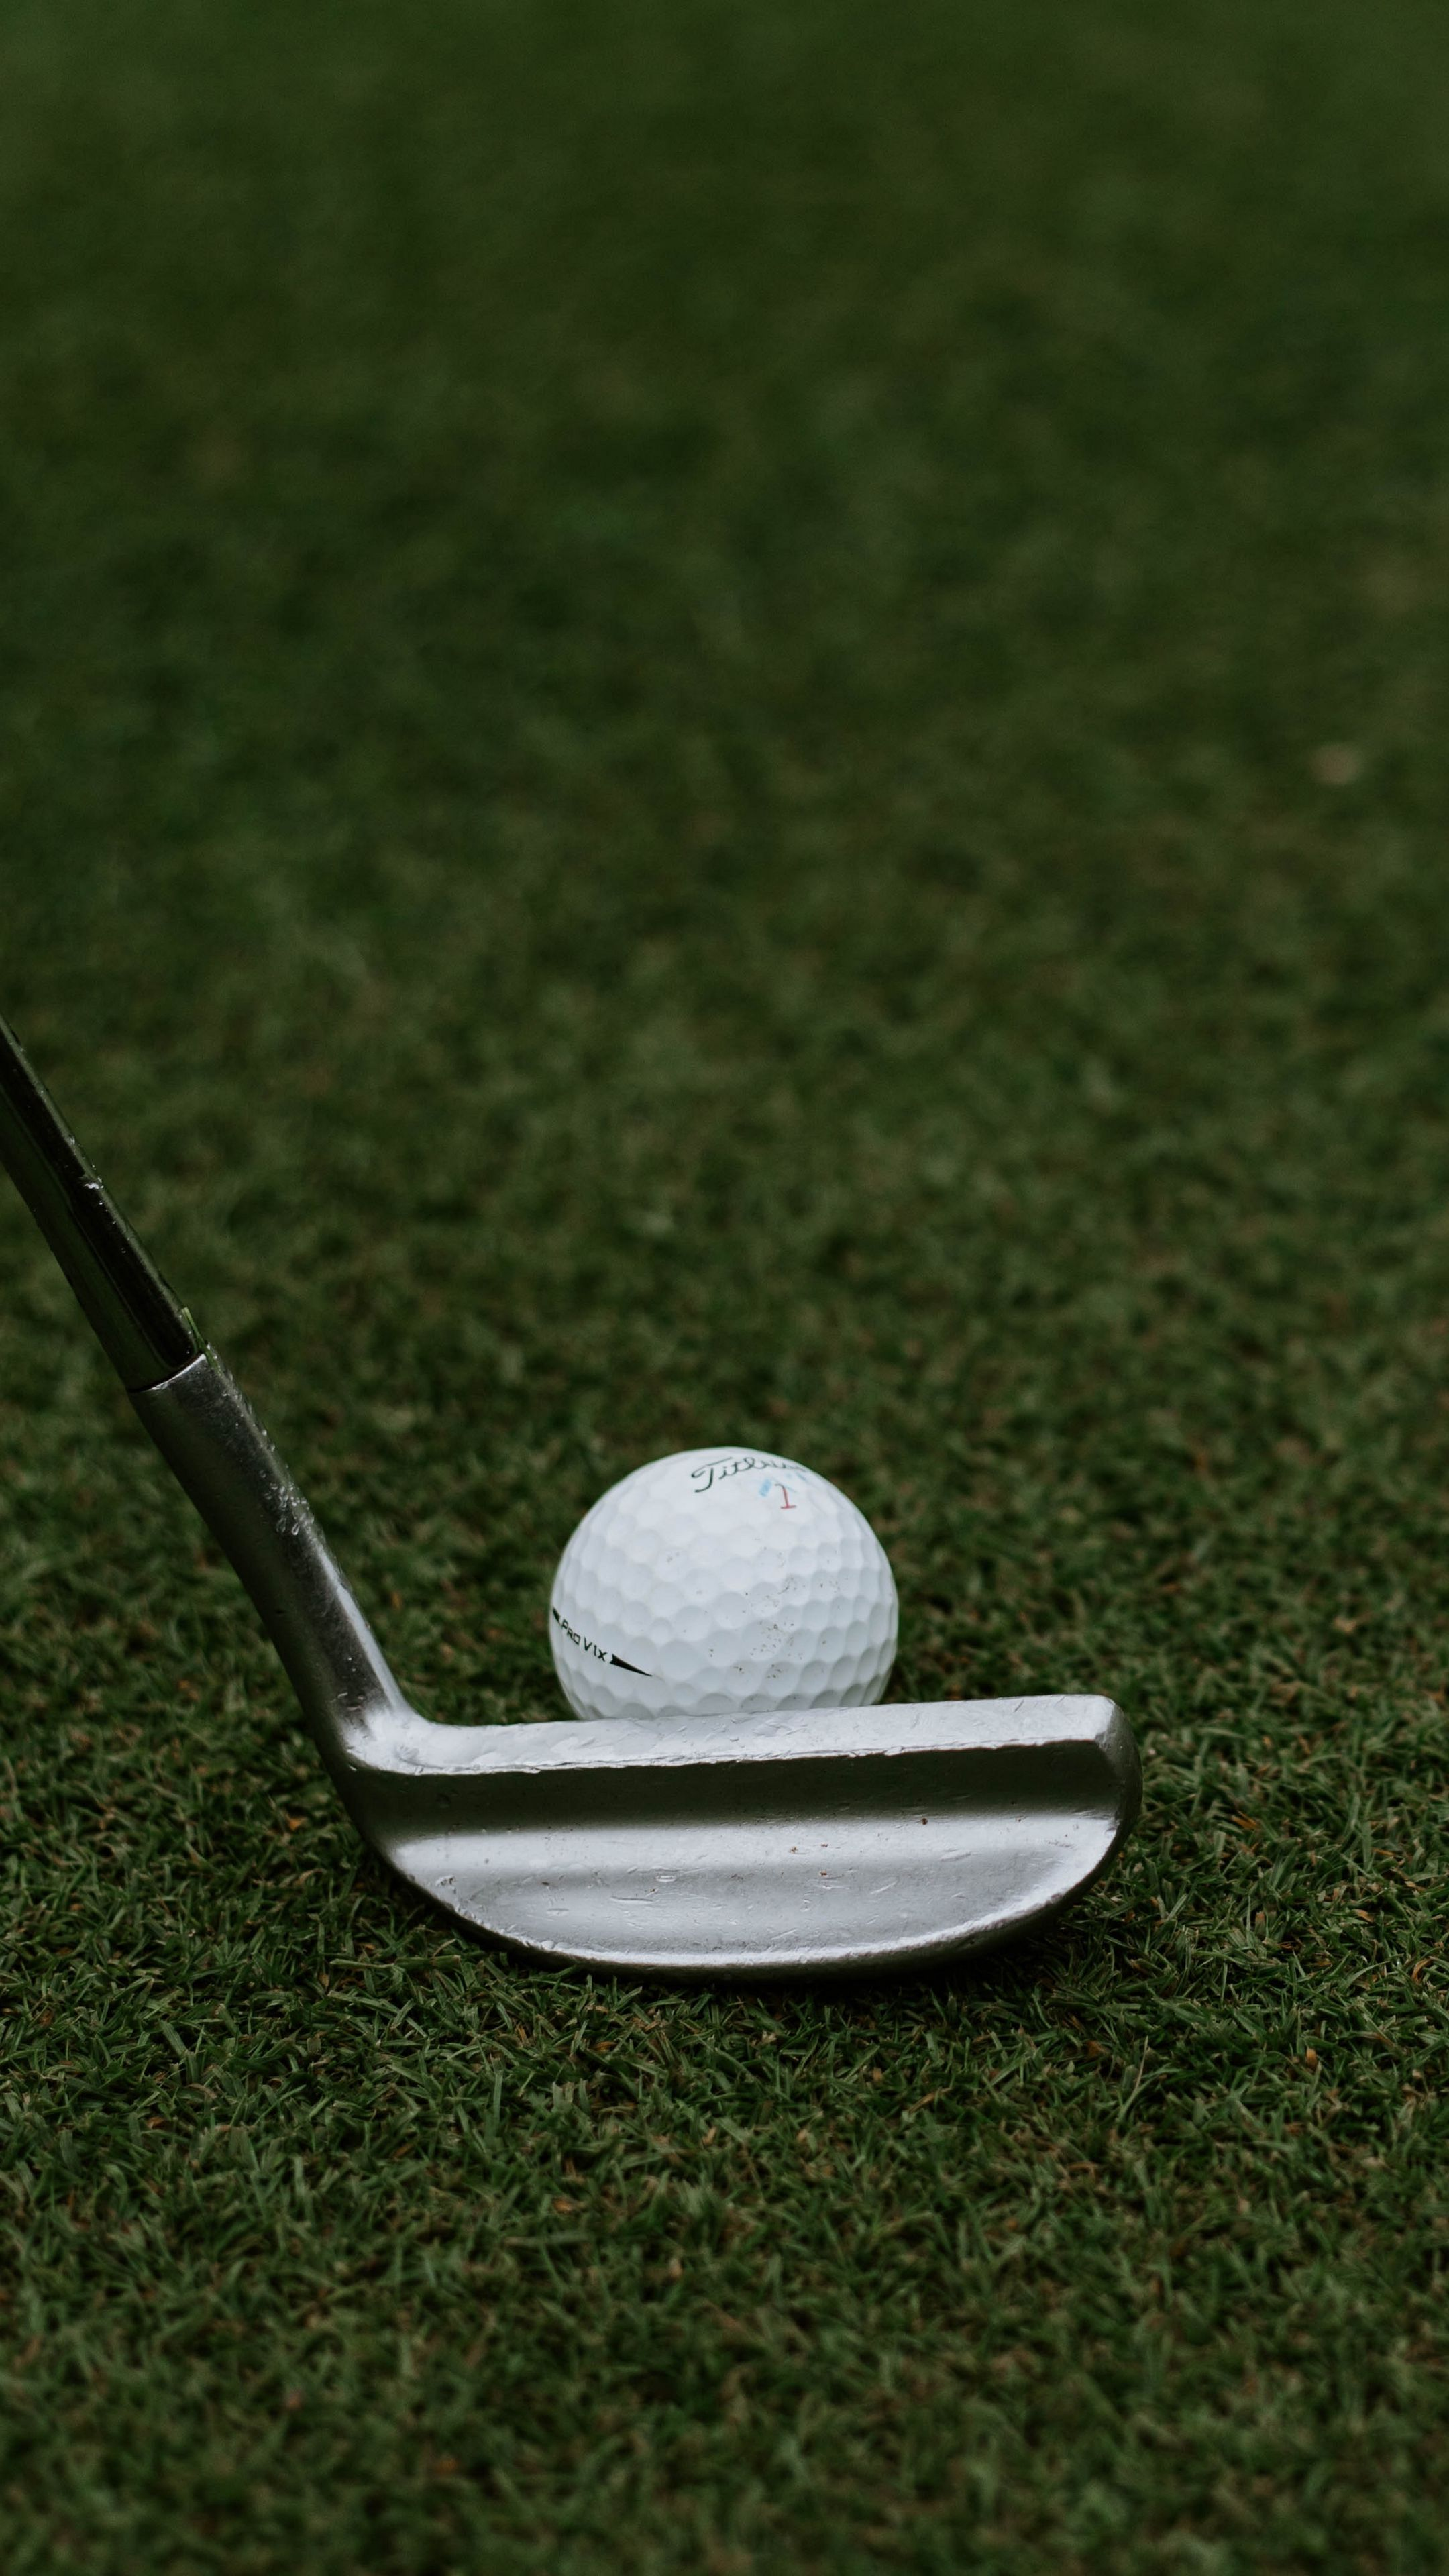 2160x3840 Wallpaper golf, ball, club